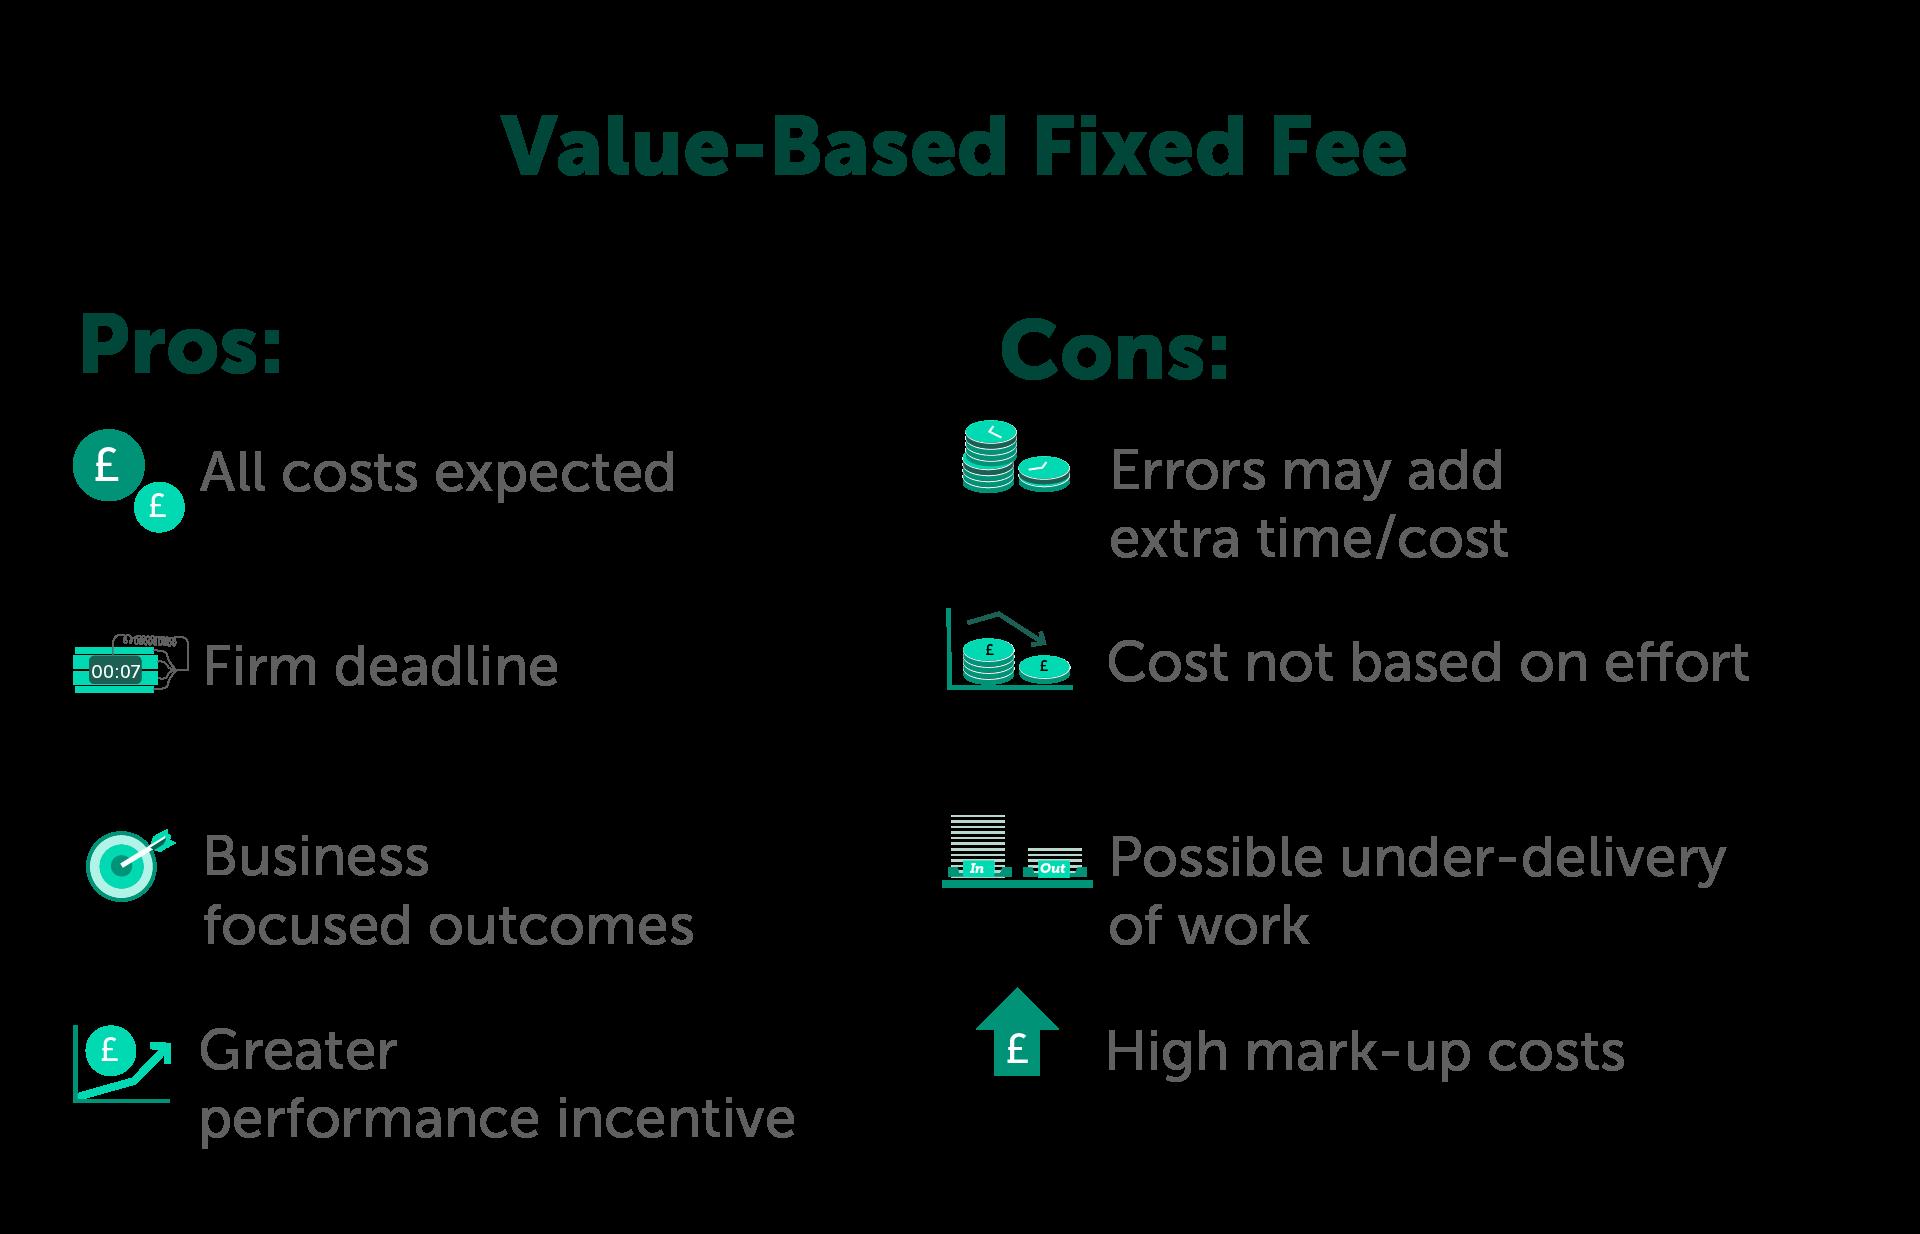 Value based Fixed Fee